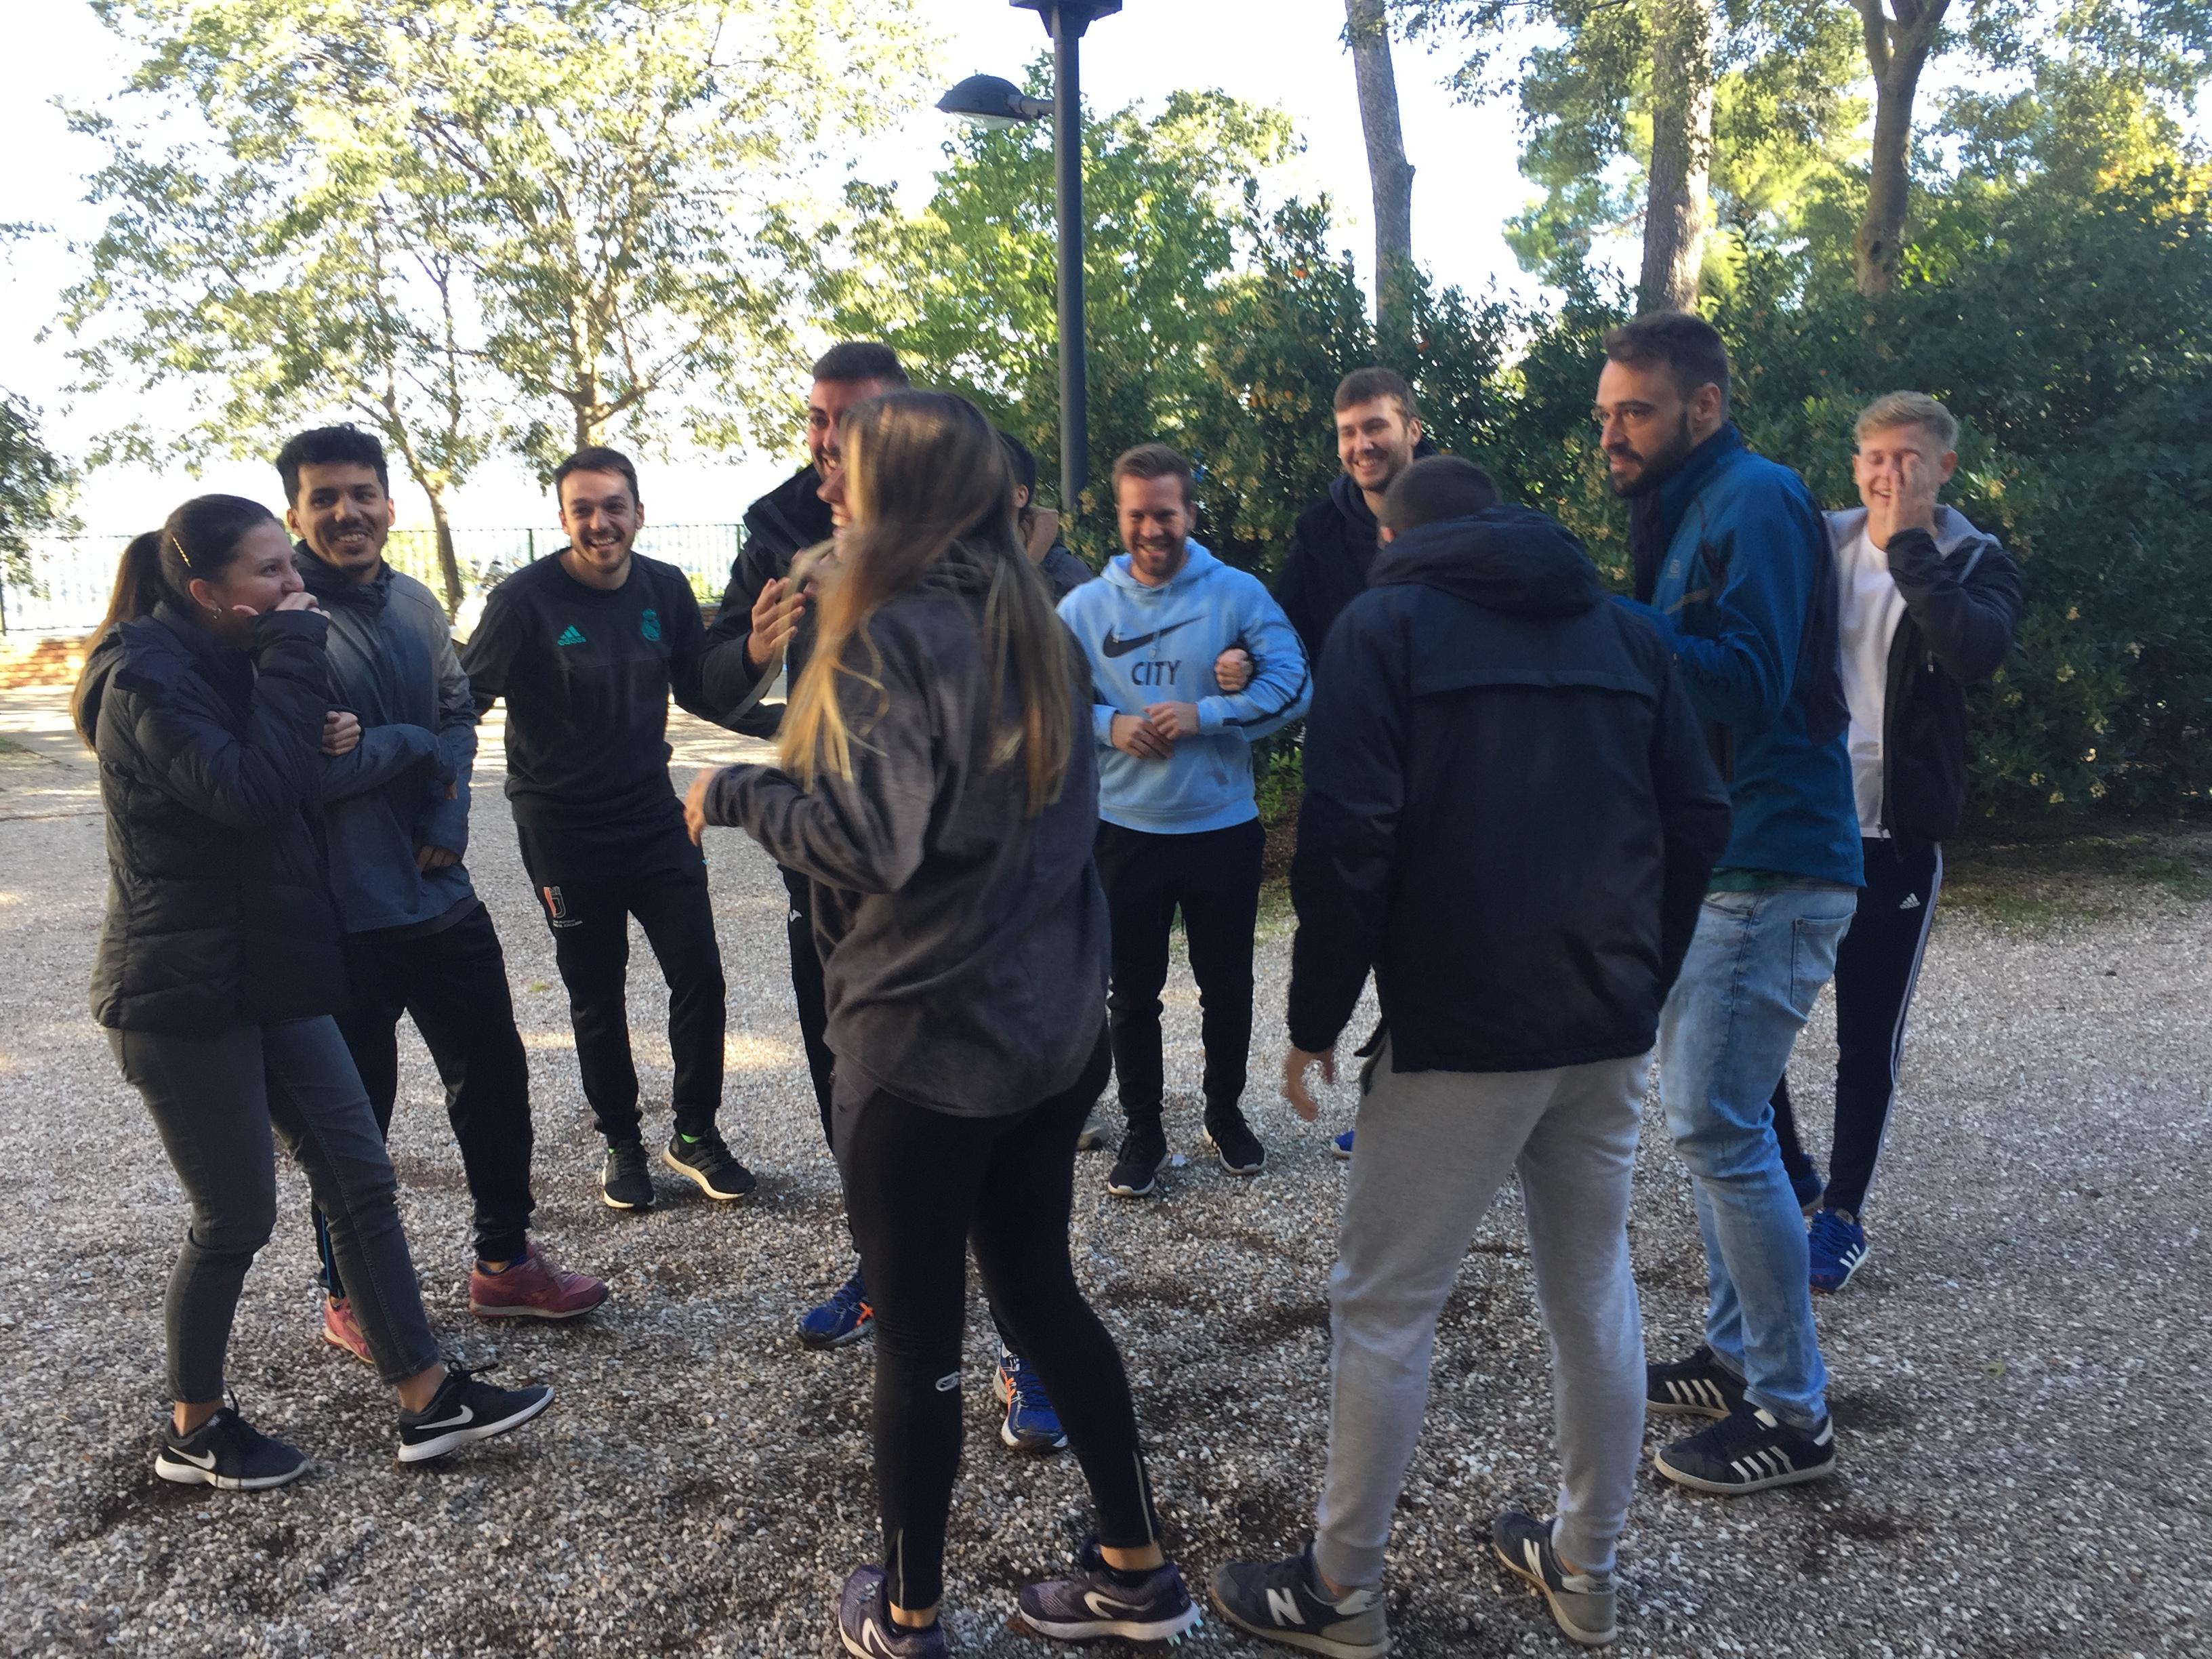 Los alumnos del MUIOL aprenden al aire libre en el parque natural de la Font Roja